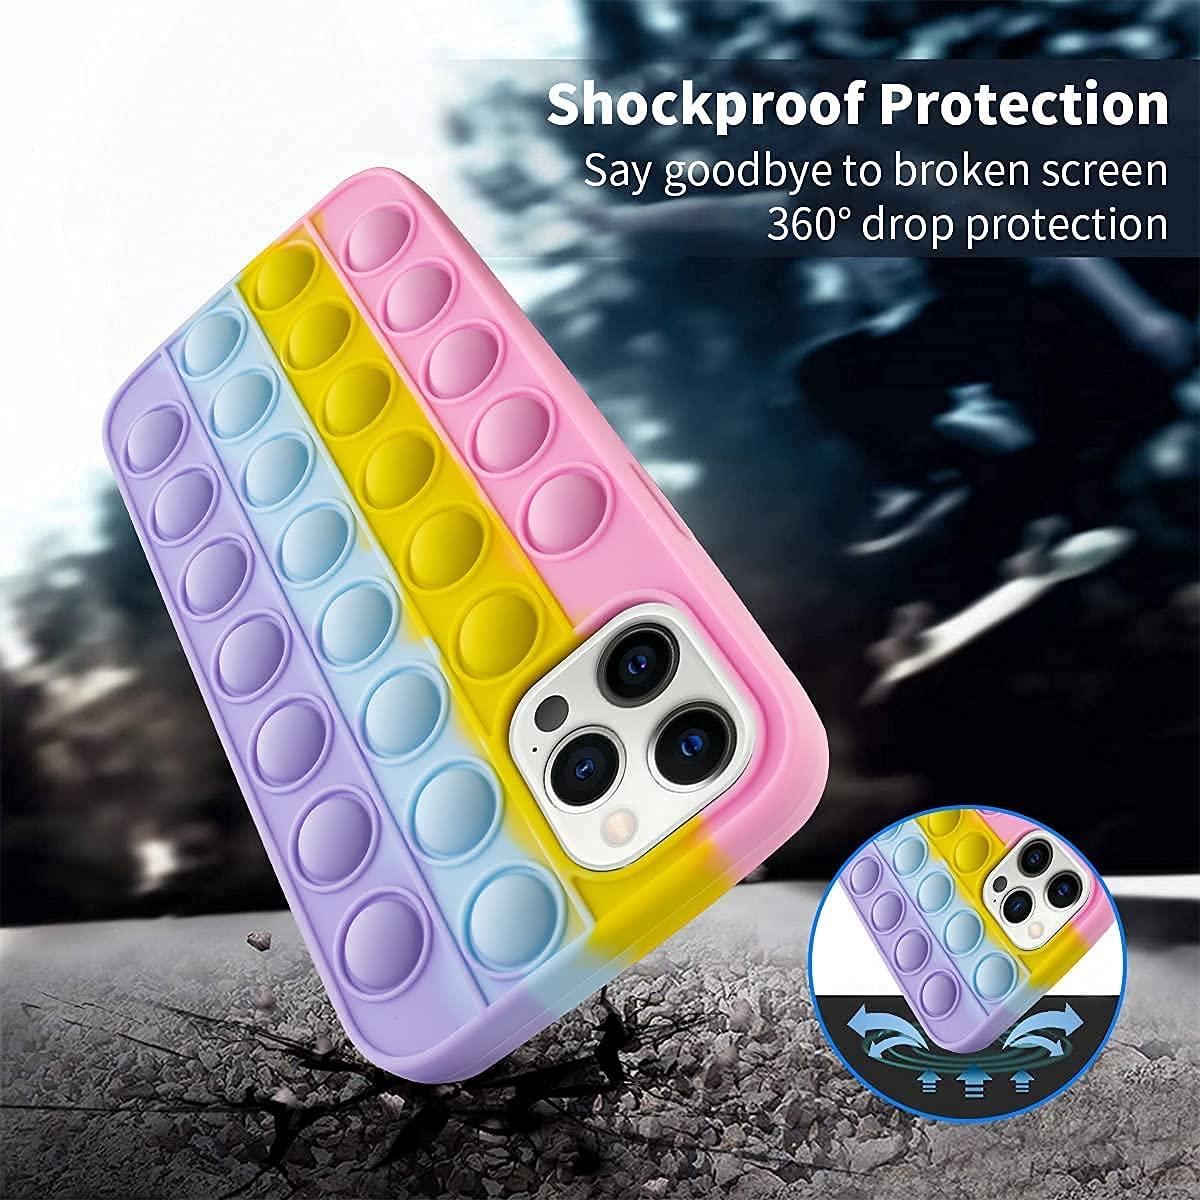 Fidget Toys Phone Case, Pop Fidget Reliver Stress Toys Push Pop Bubble Protecive Phone Case, Silicone Shockproof Phone Cover, Anti-Fall Shockproof Silicone Phone Case (iPhone X / Xs)